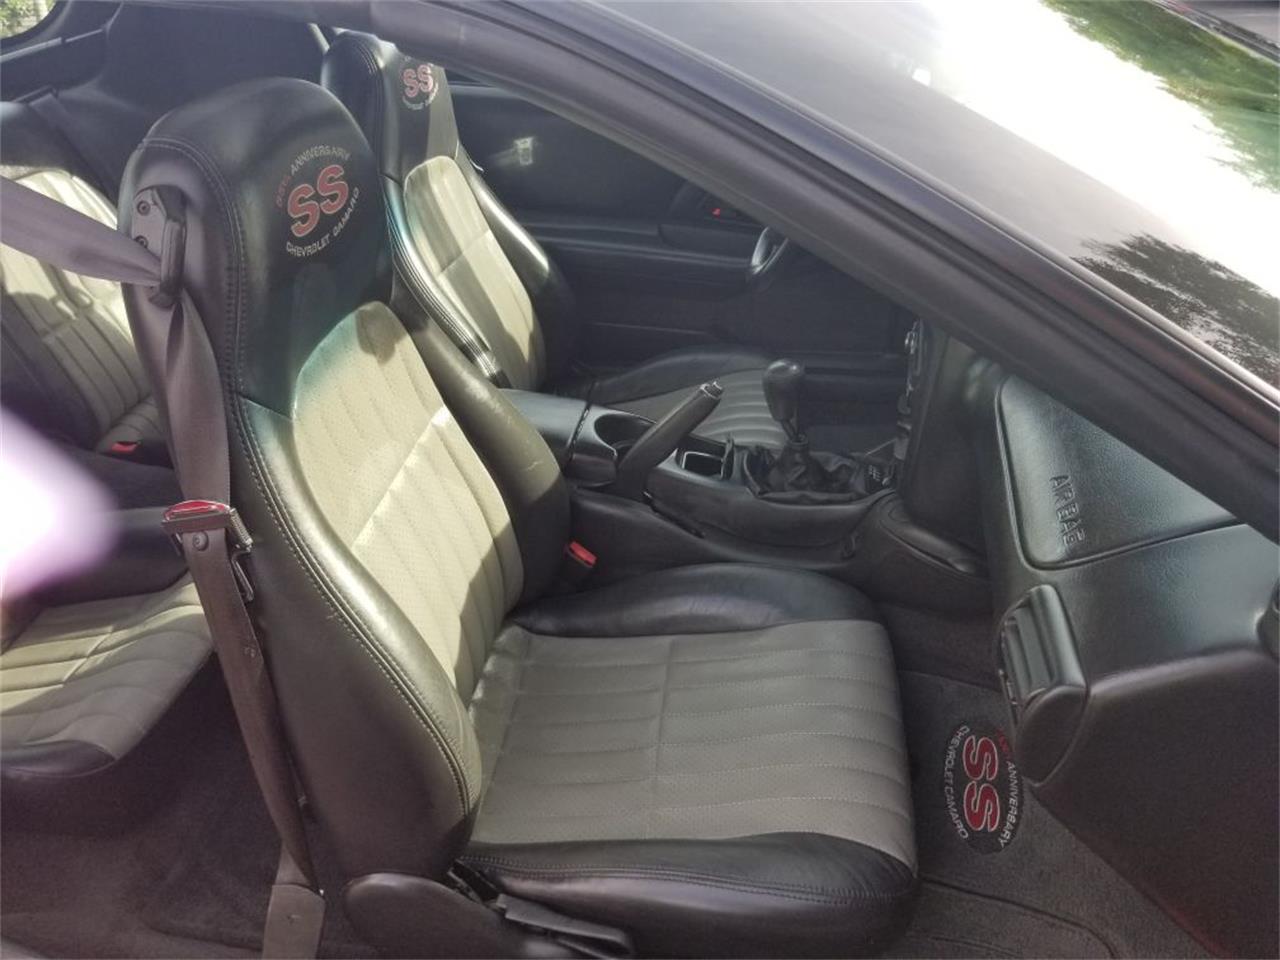 2002 Chevrolet Camaro (CC-1355483) for sale in Fullerton, California